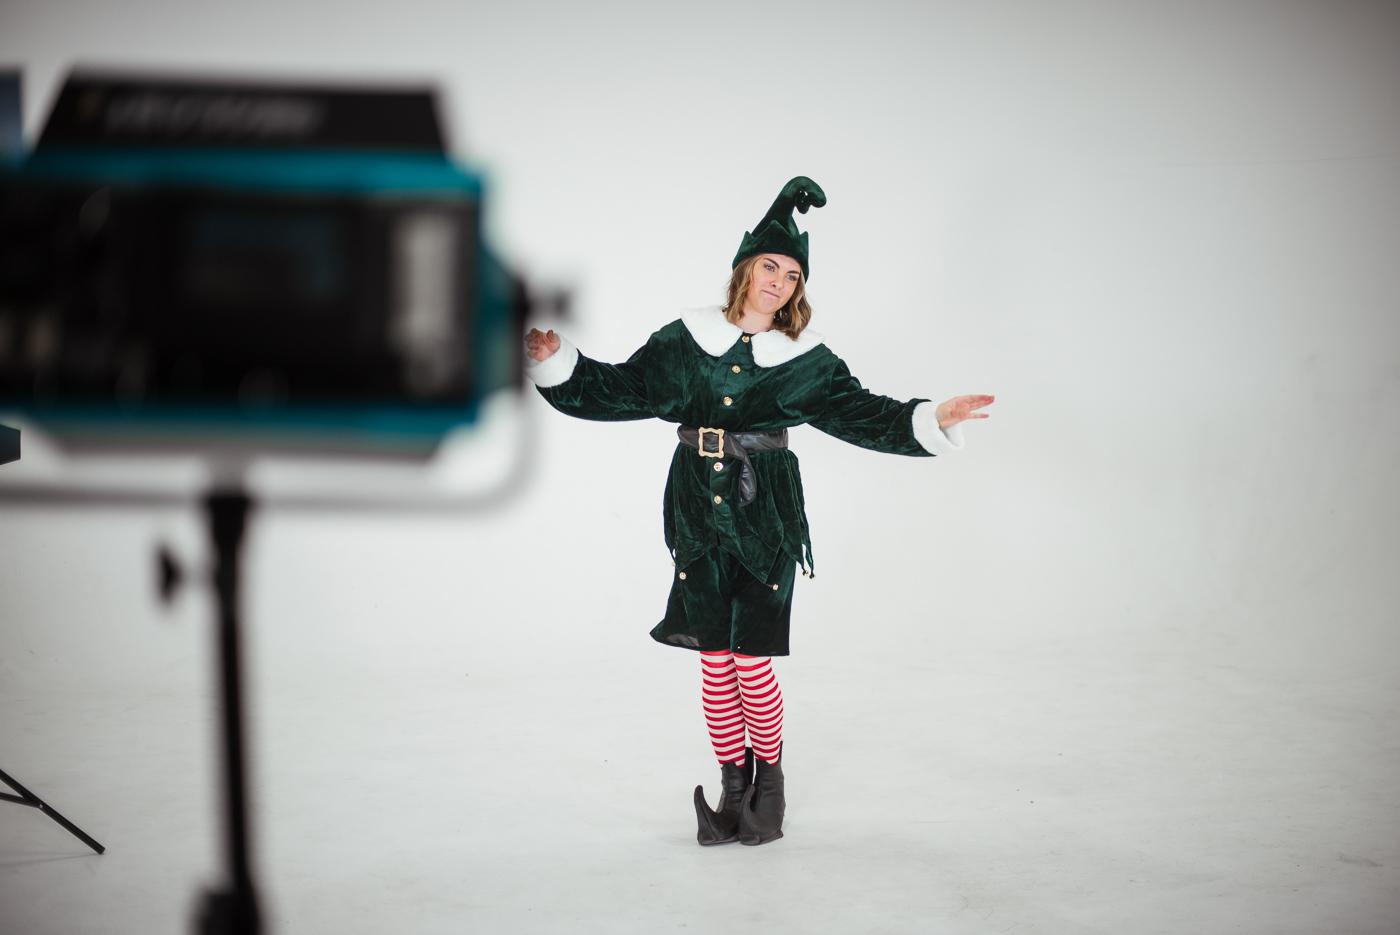 PHOCO Christmas Card The Articulate Photo Studio Cyclorama Infinity Wall Colorado Fort Collins Photographer Elf Yourself BTS-10.jpg